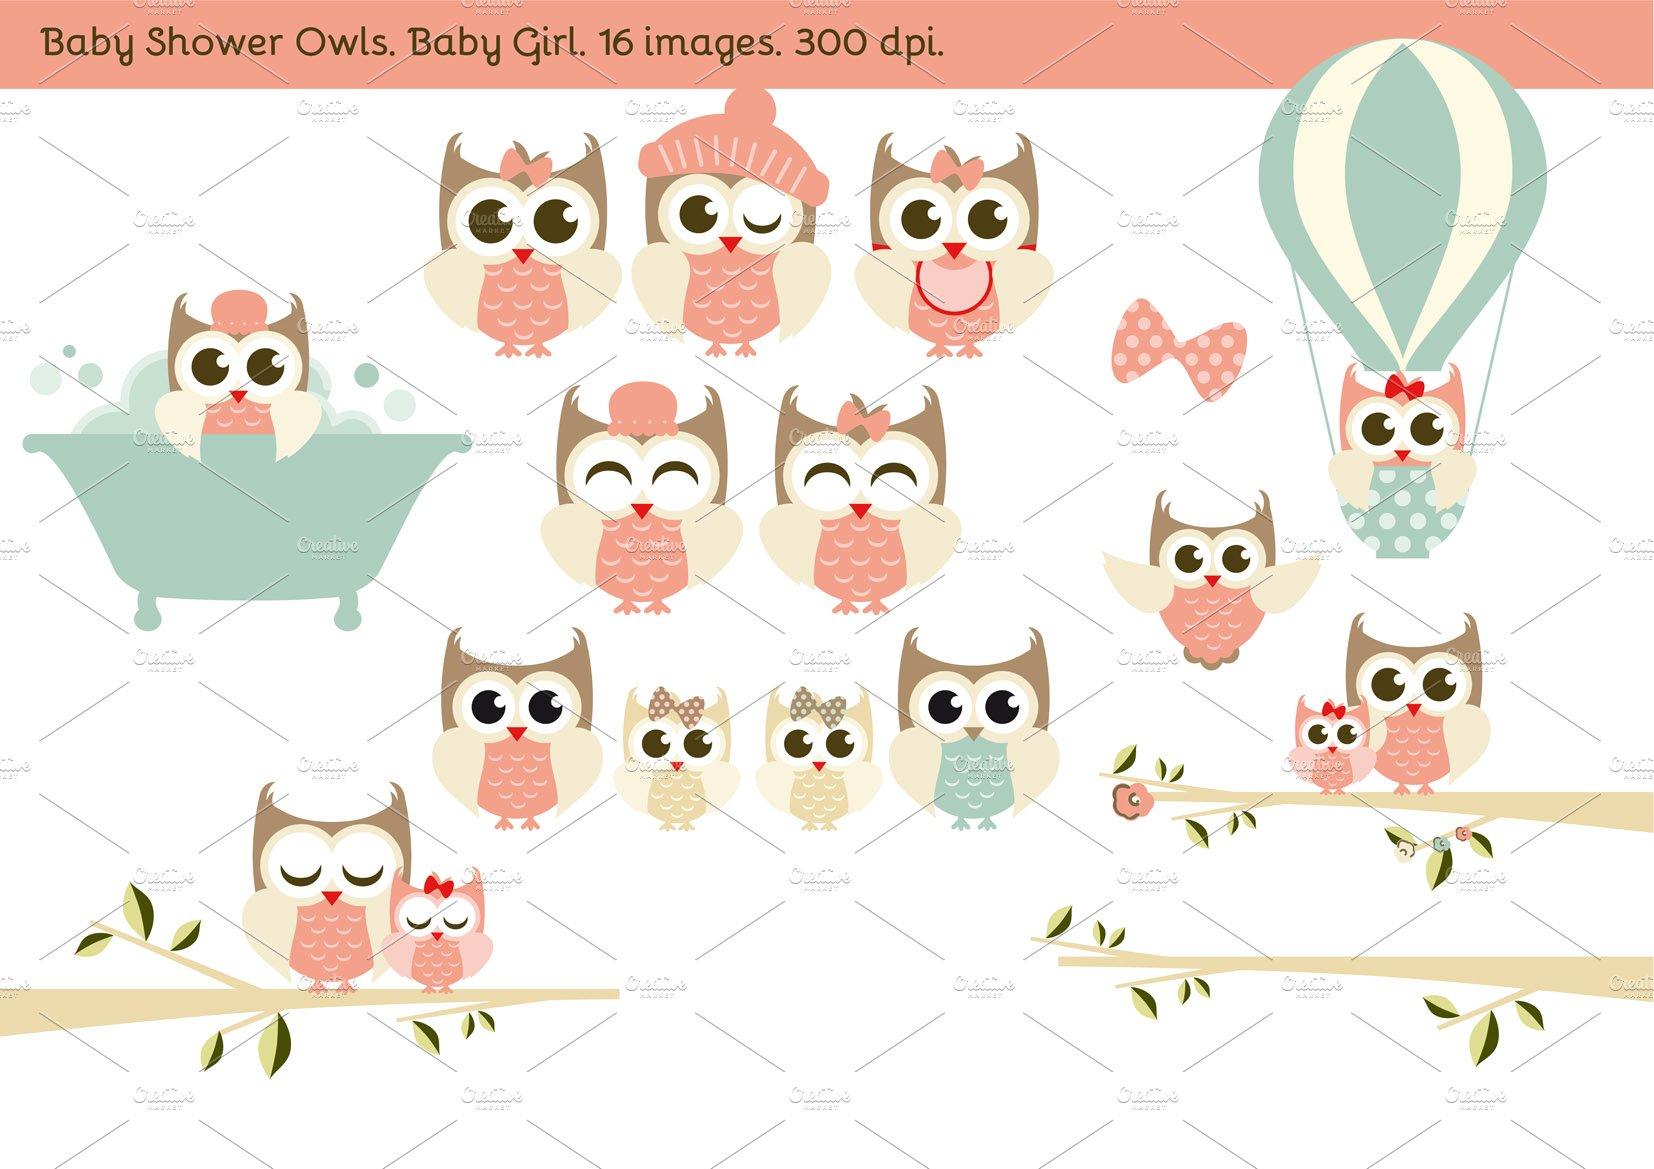 Baby Shower Owls Baby Girl Illustrations Creative Market